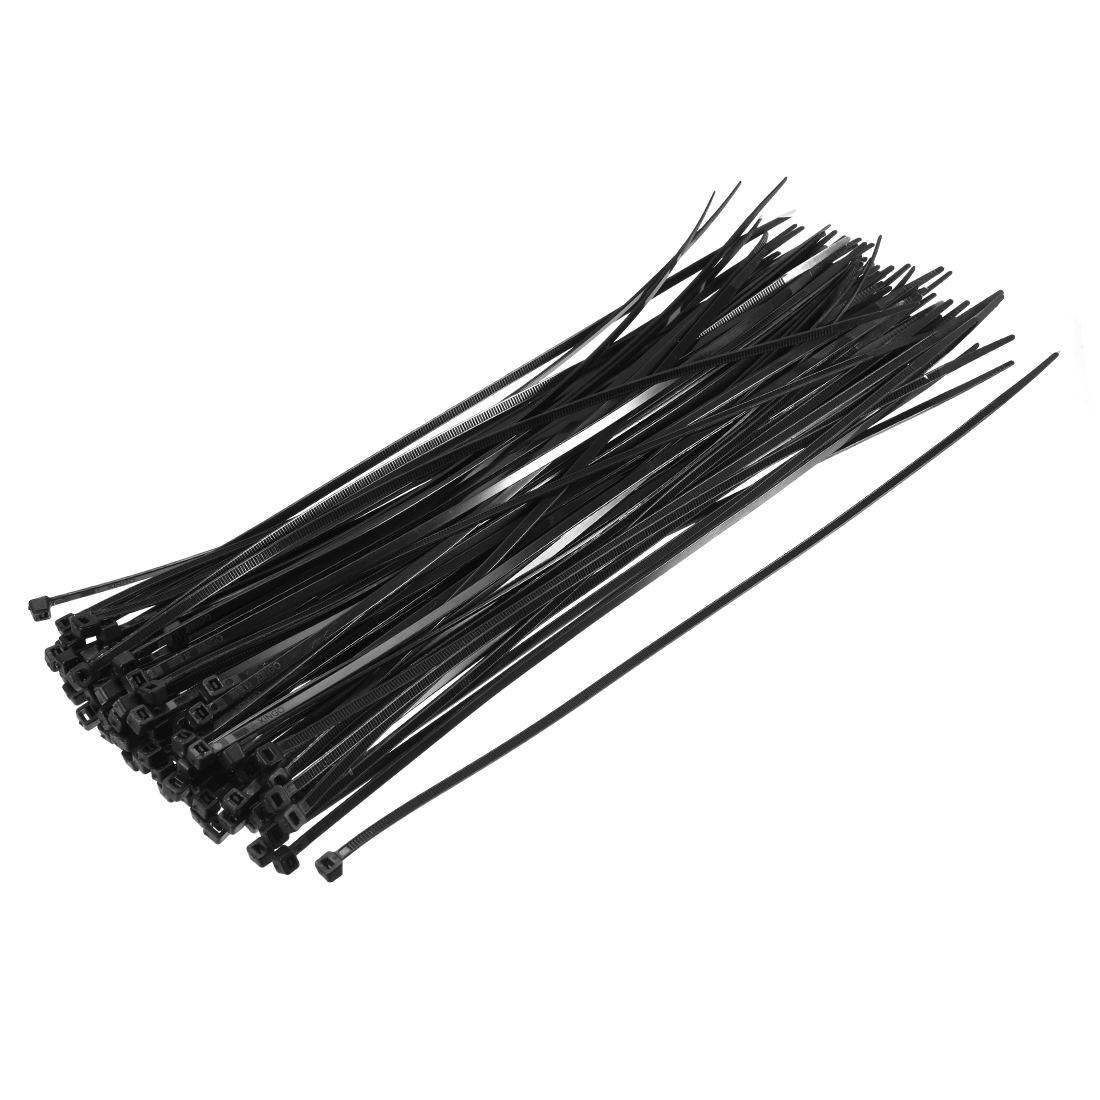 Cable Zip Ties 250mmx3.6mm Self-Locking Nylon Tie Wraps Black 150pcs